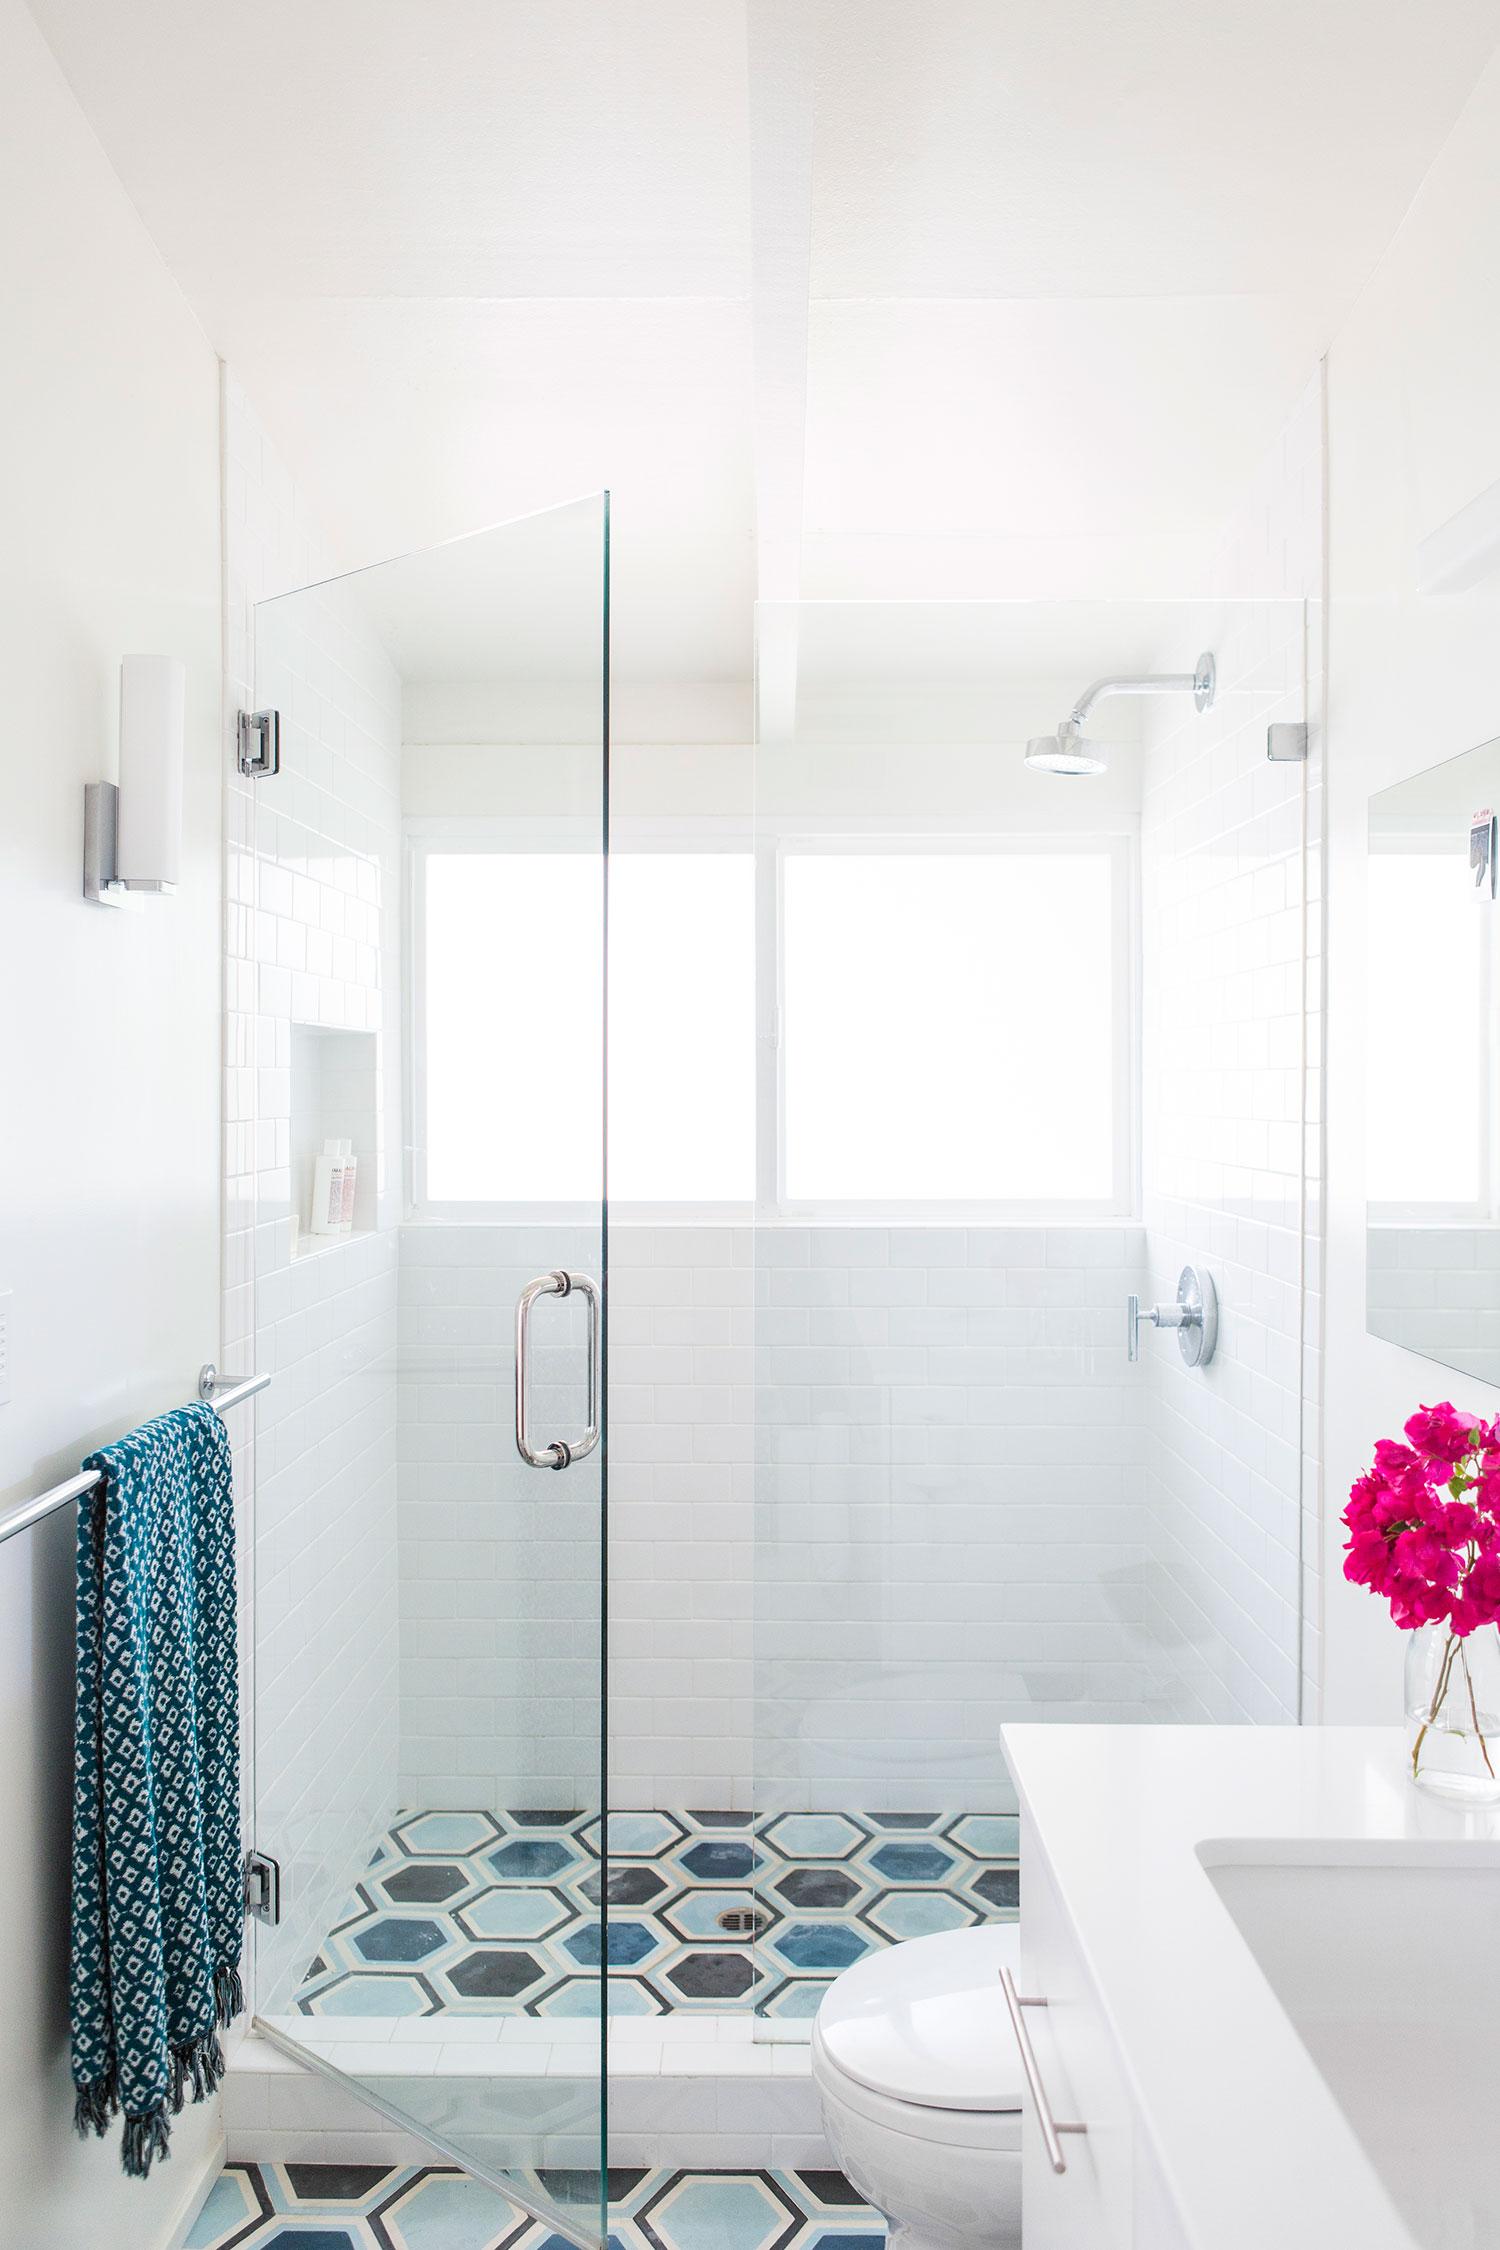 Inspirerende badkamer vebouwing van ontwerpstudio Mend